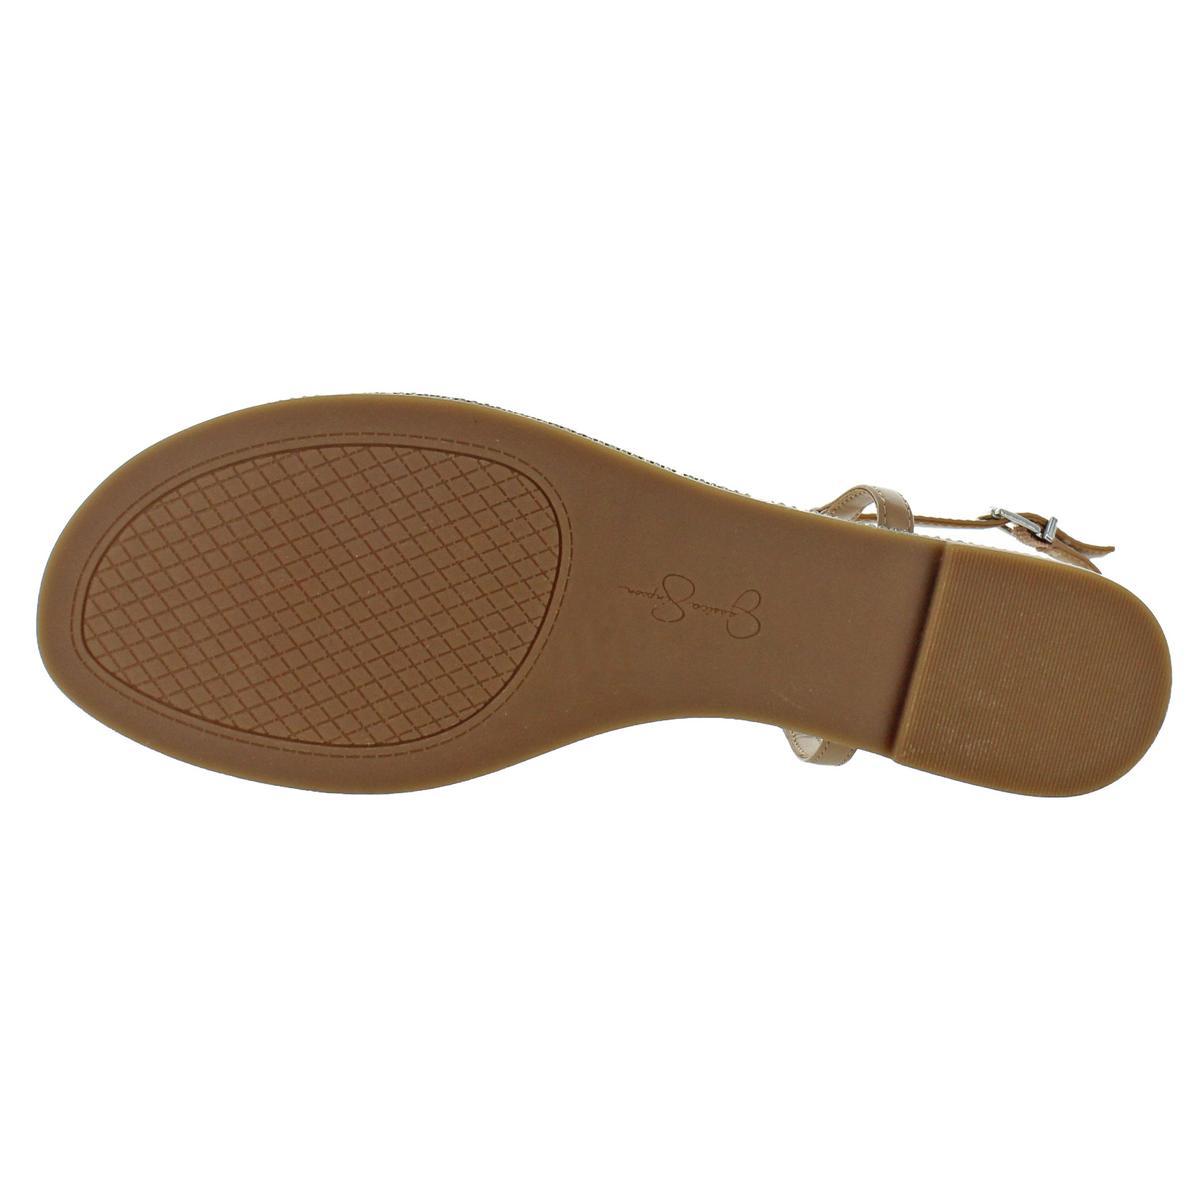 Jessica-Simpson-Femme-Brimah-Casual-String-Spartiates-Chaussures-BHFO-1194 miniature 6